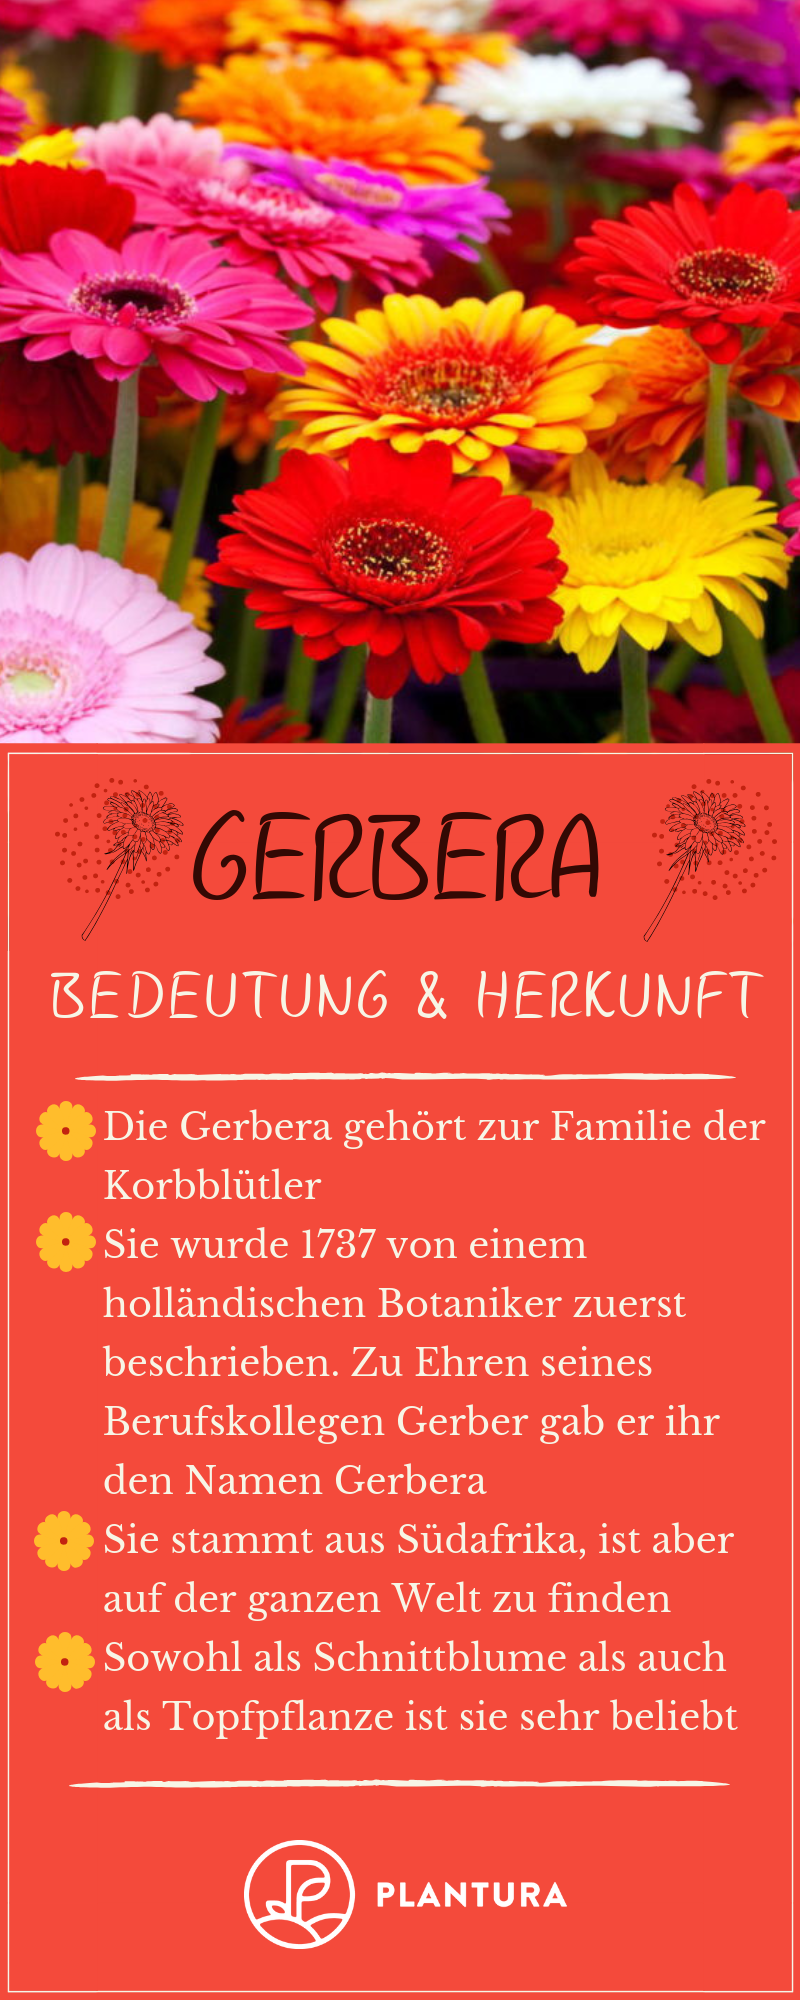 Gerbera Im Topf Im Garten Als Schnittblume Plantura Schnittblumen Gerbera Pflanzen